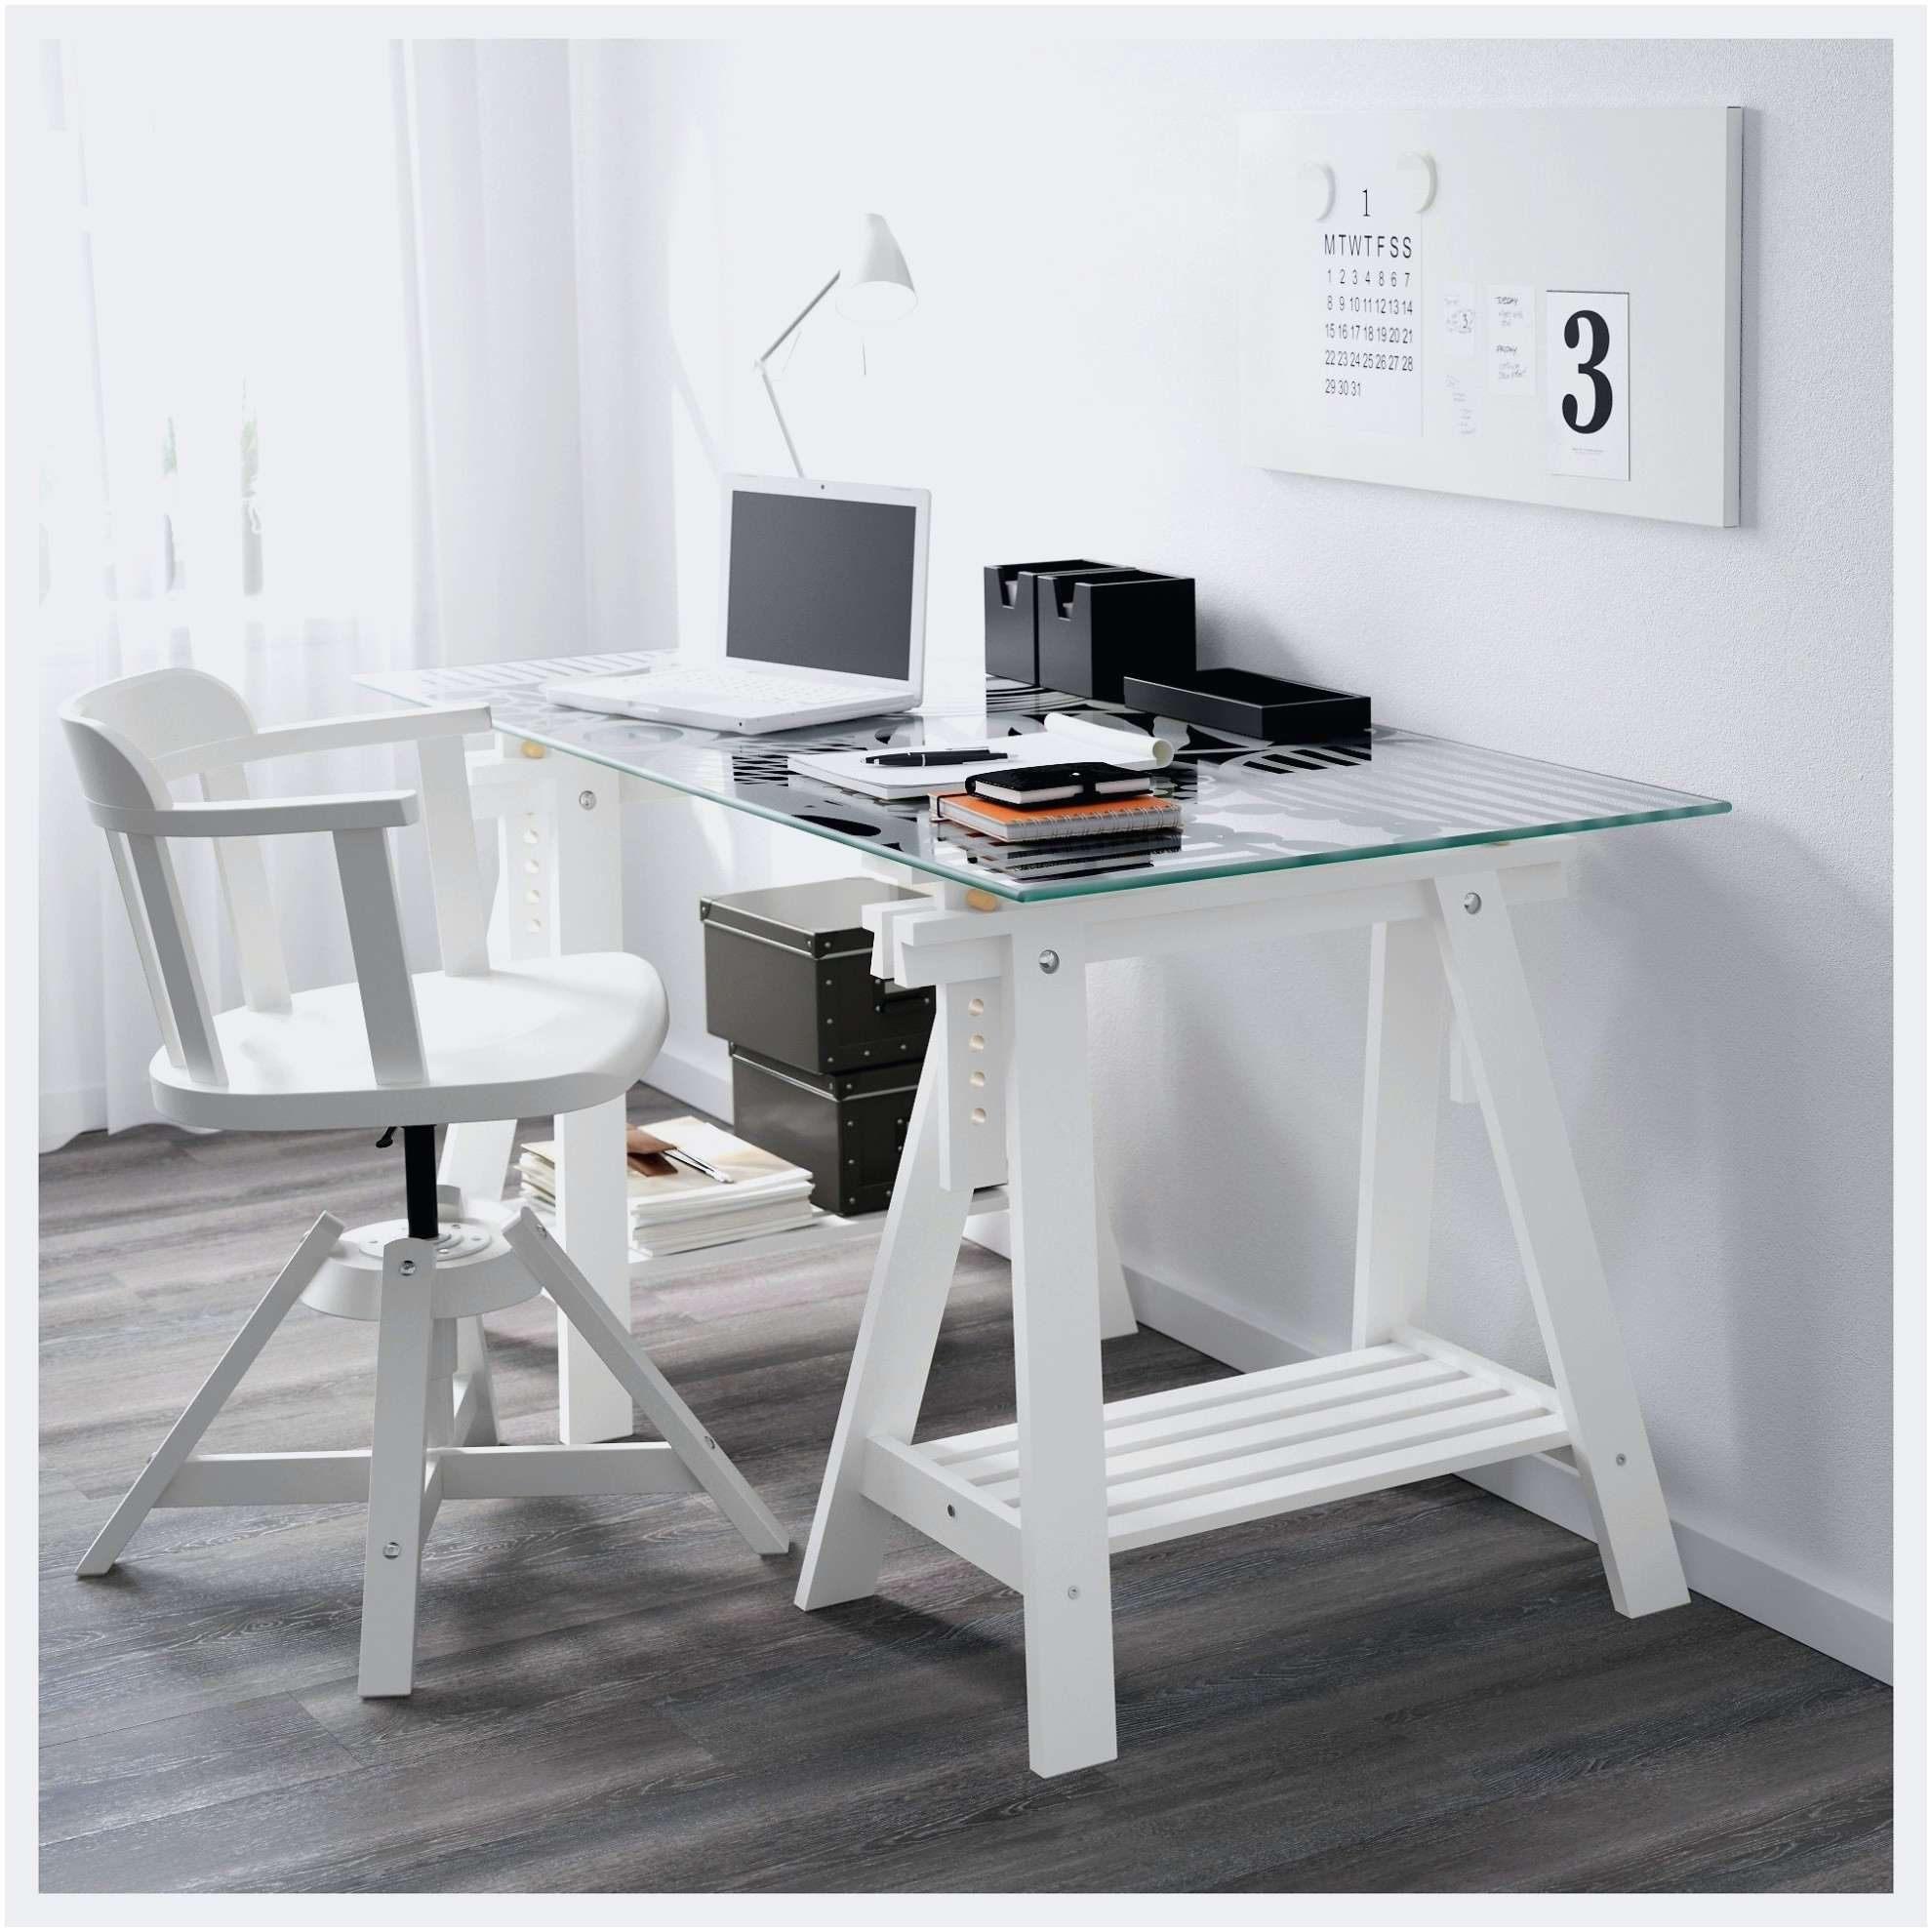 Lit 2 Places Bois Joli Luxe Extraordinaire Bureau Angle Ikea but Trendy New Study Reveals